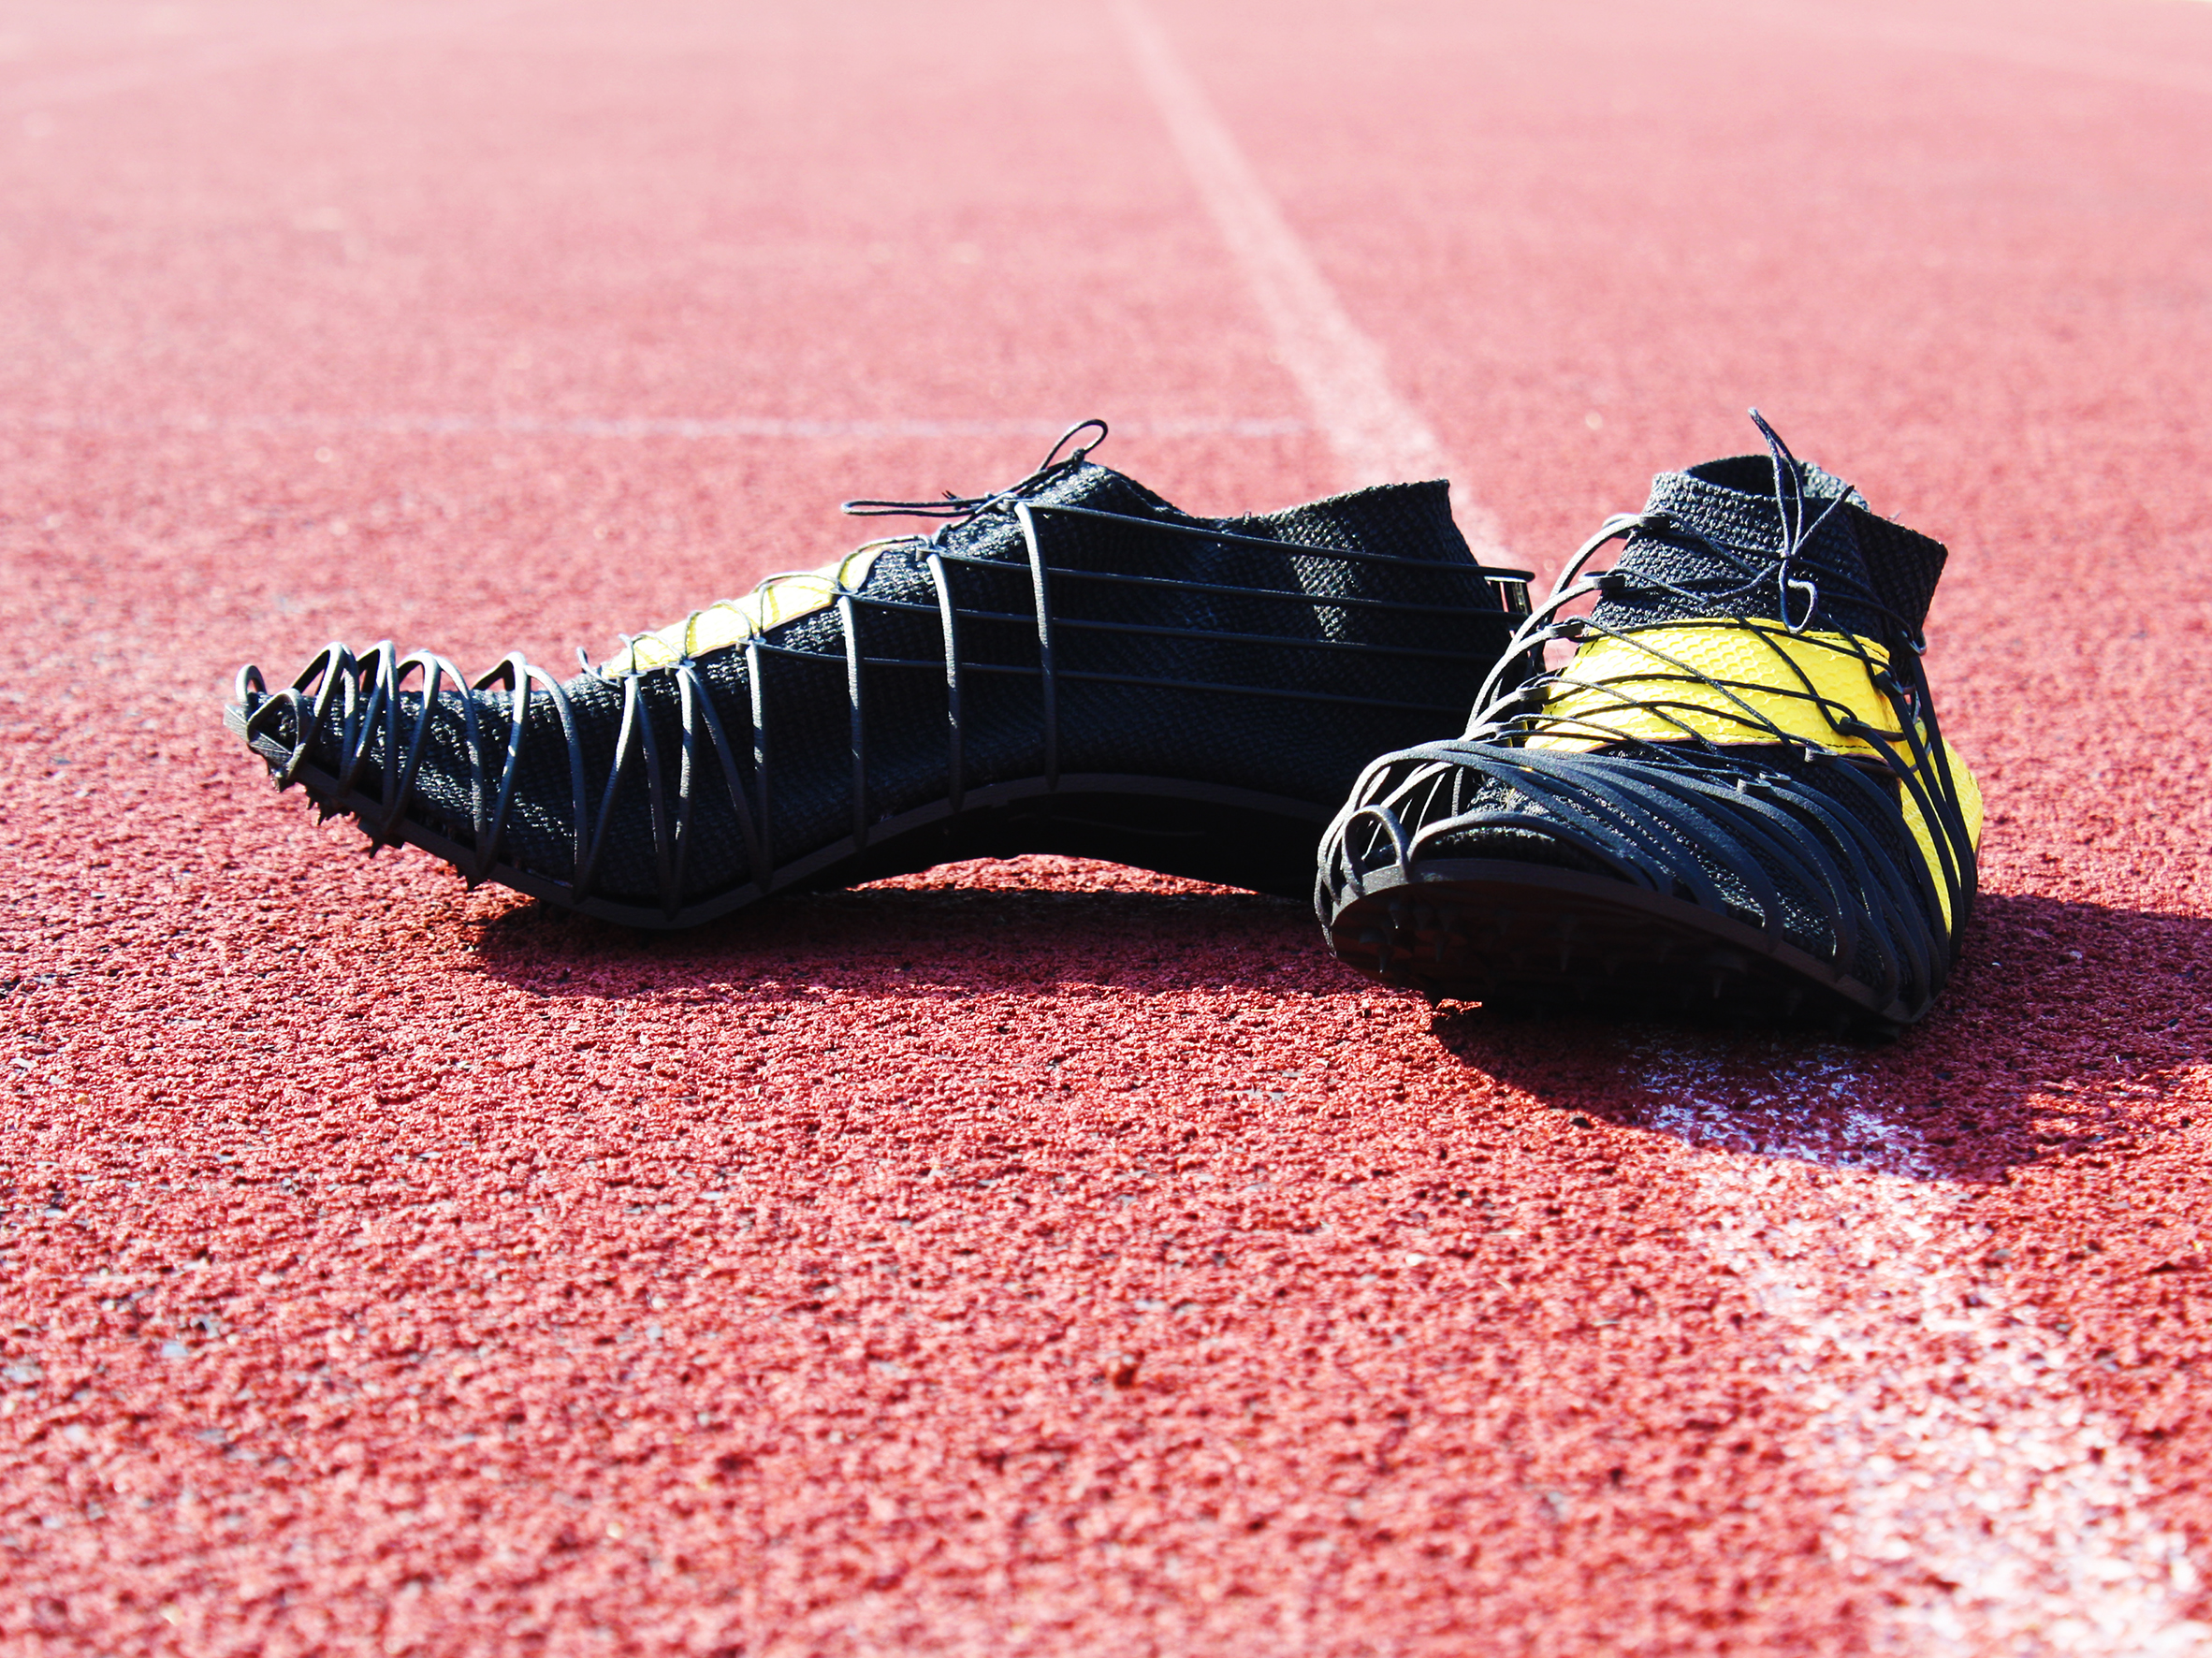 Miro Buroni's Pleko spike shoes, 3D printed by CRP Technology. Photo via CRP Technology.